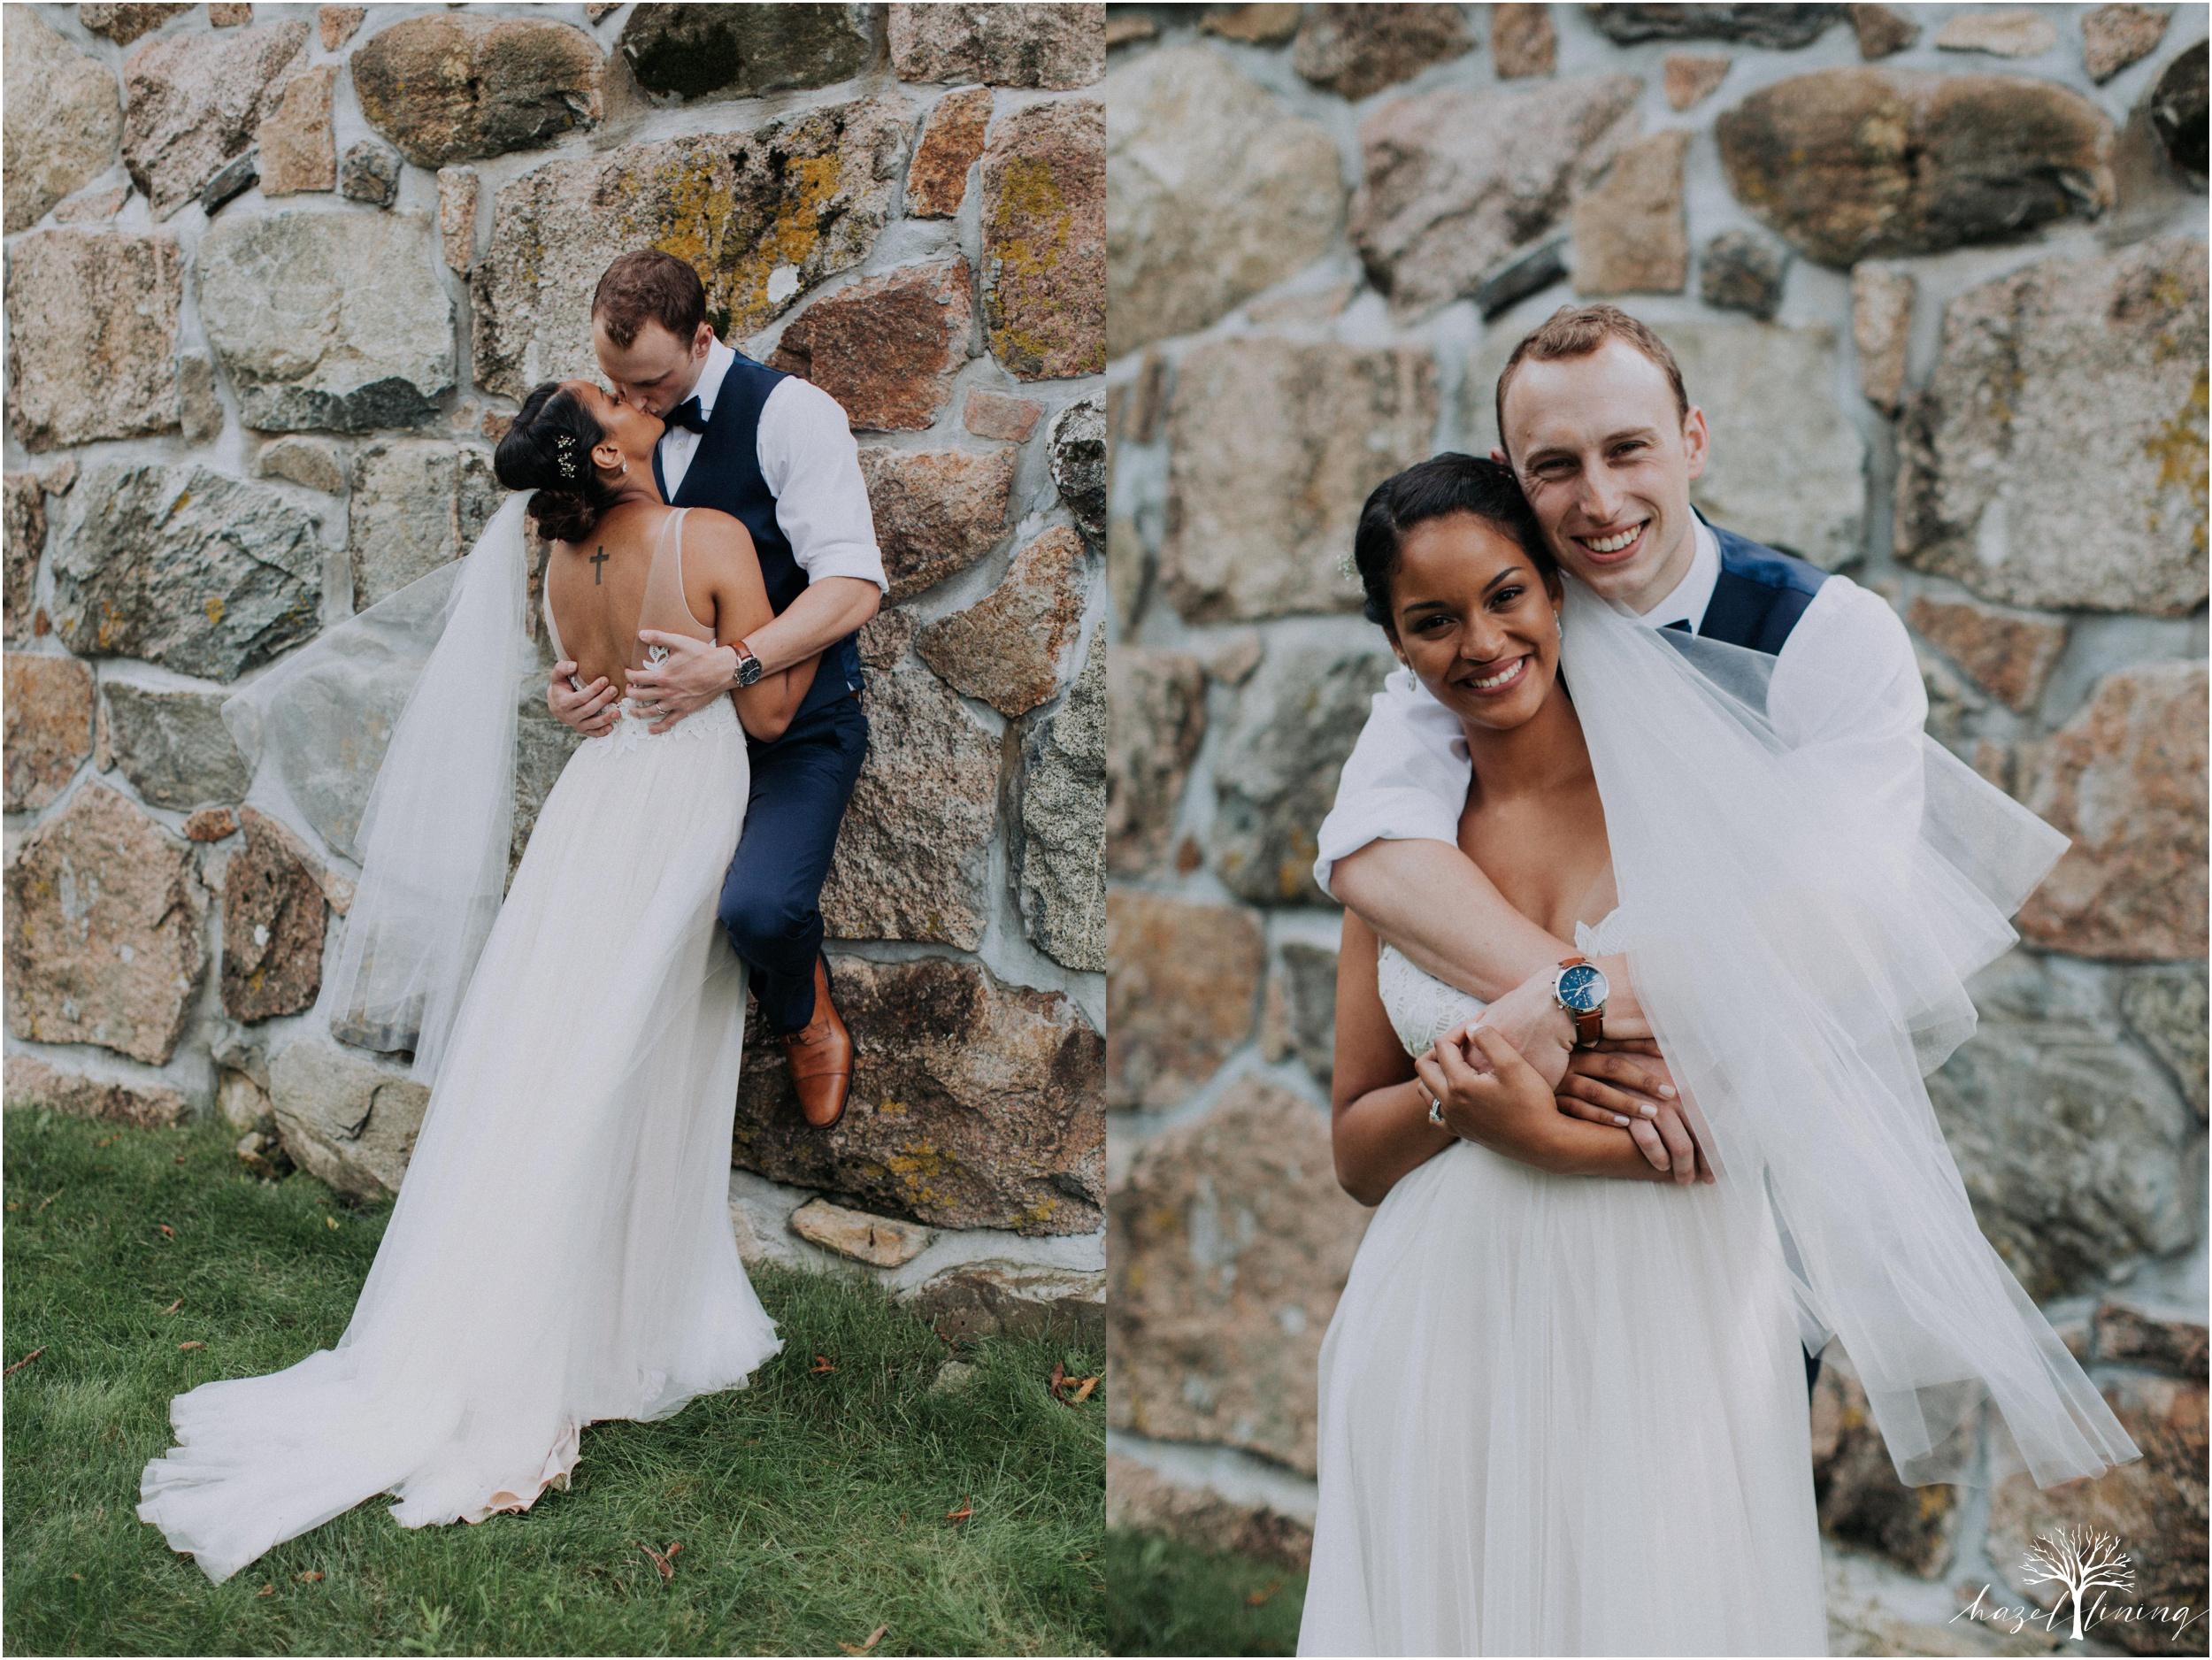 mariah-kreyling-samuel-sherratt-sherrattwiththeworld-peirce-farm-at-witch-hill-boston-massachusetts-wedding-photography-hazel-lining-travel-wedding-elopement-photography_0141.jpg